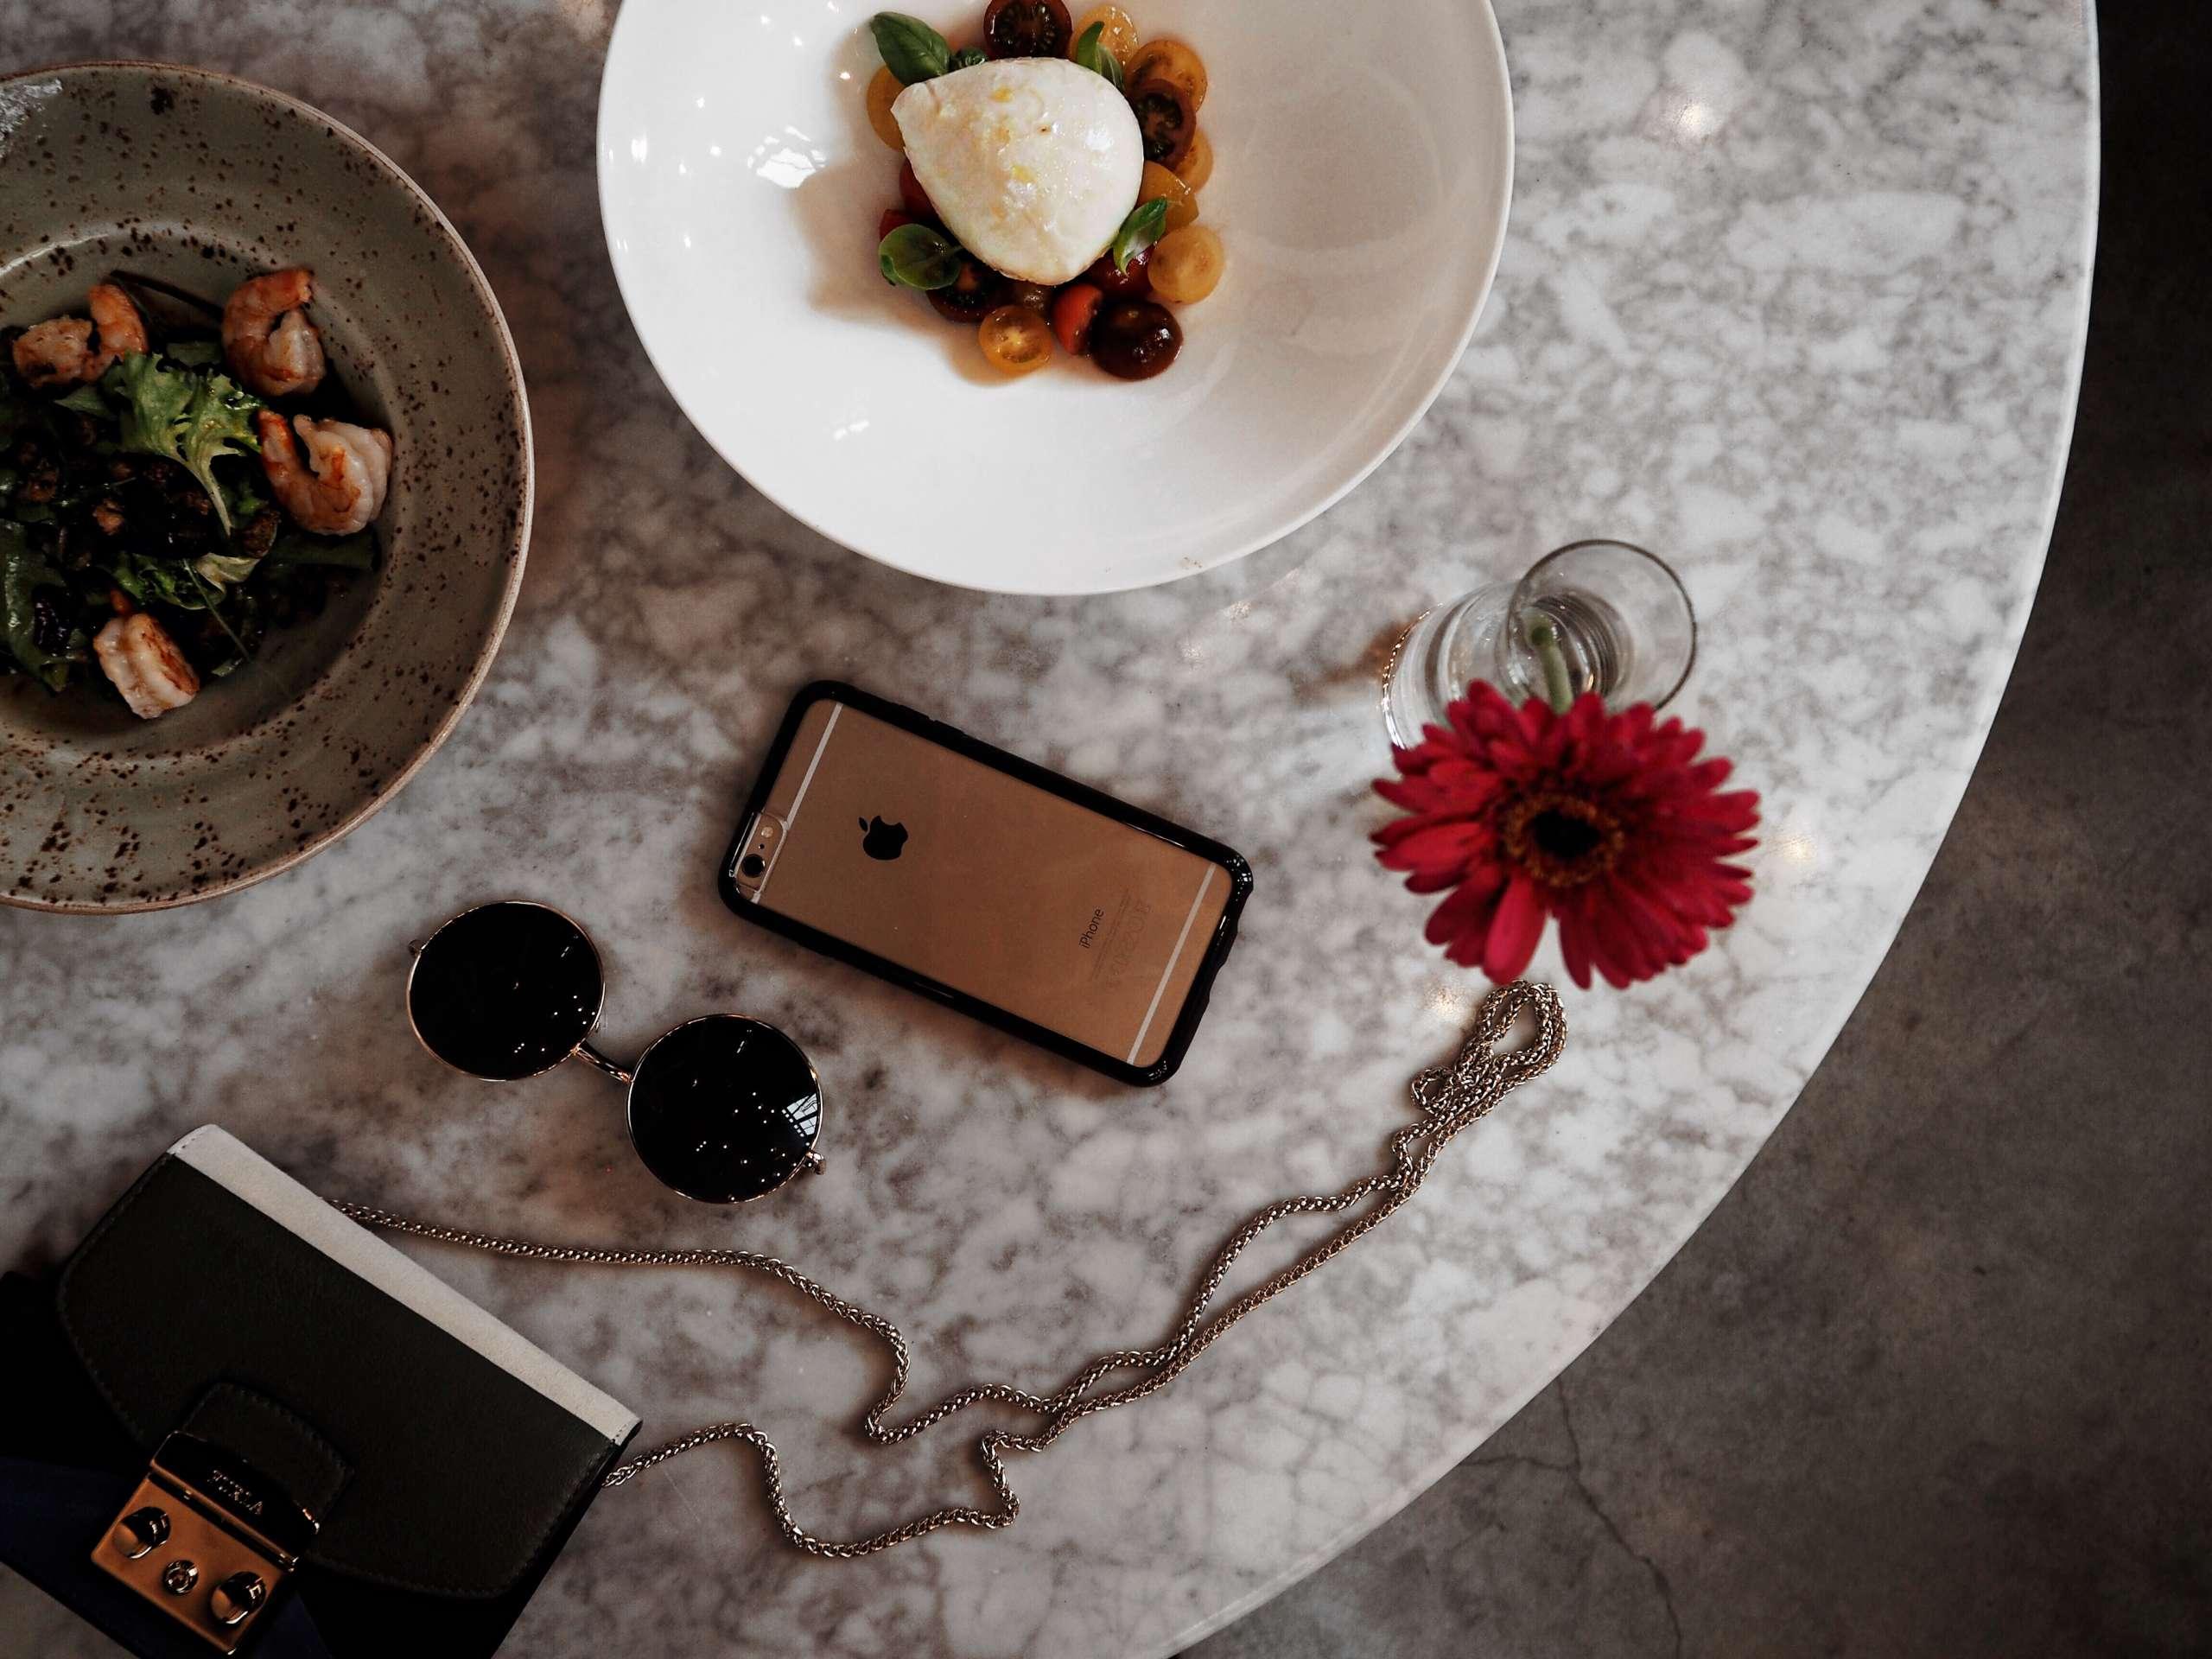 amsterdam-furla-mini-bag-remise47-restaurant-review-round-sunglasses-zerouv-otterbox-phone-case